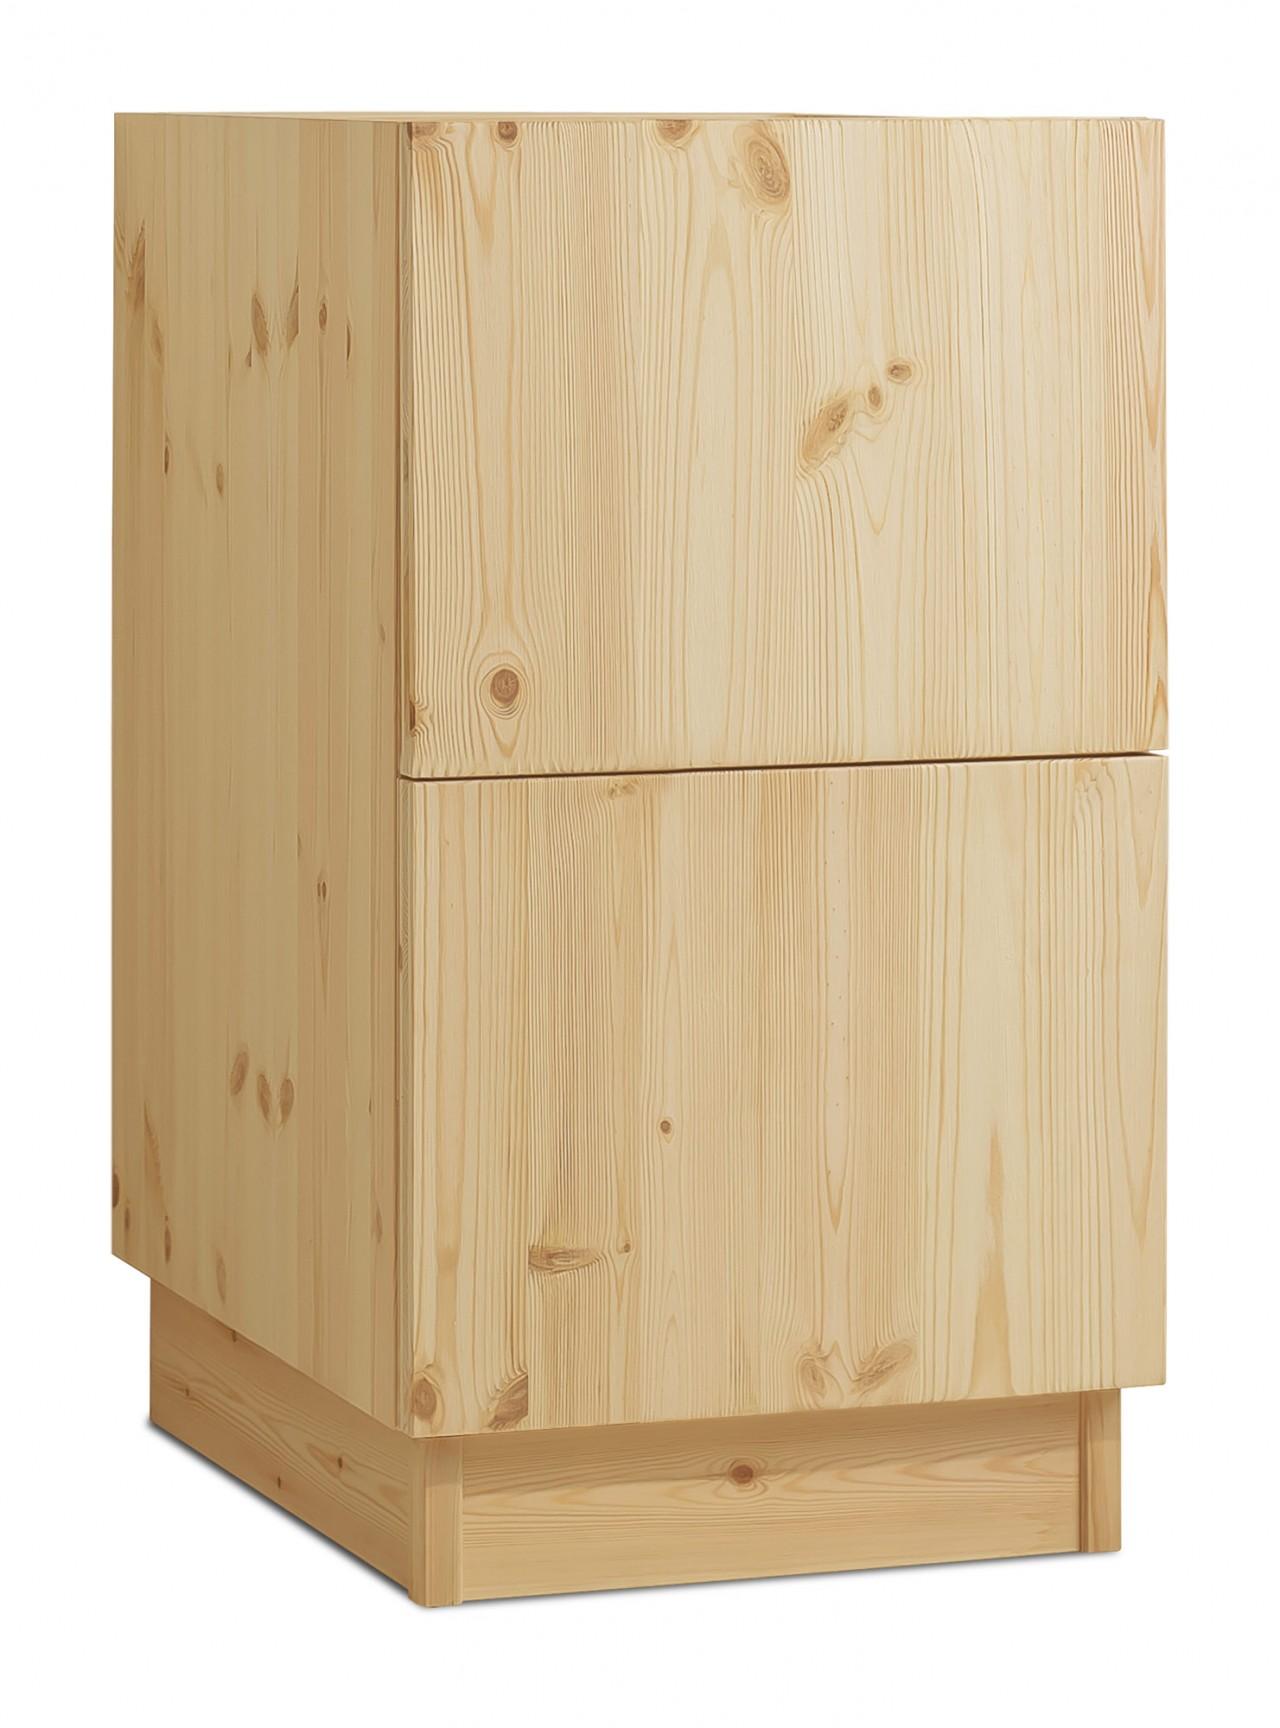 Base cucina anta milano base cassettiera da 45 2c for 2c arredamenti